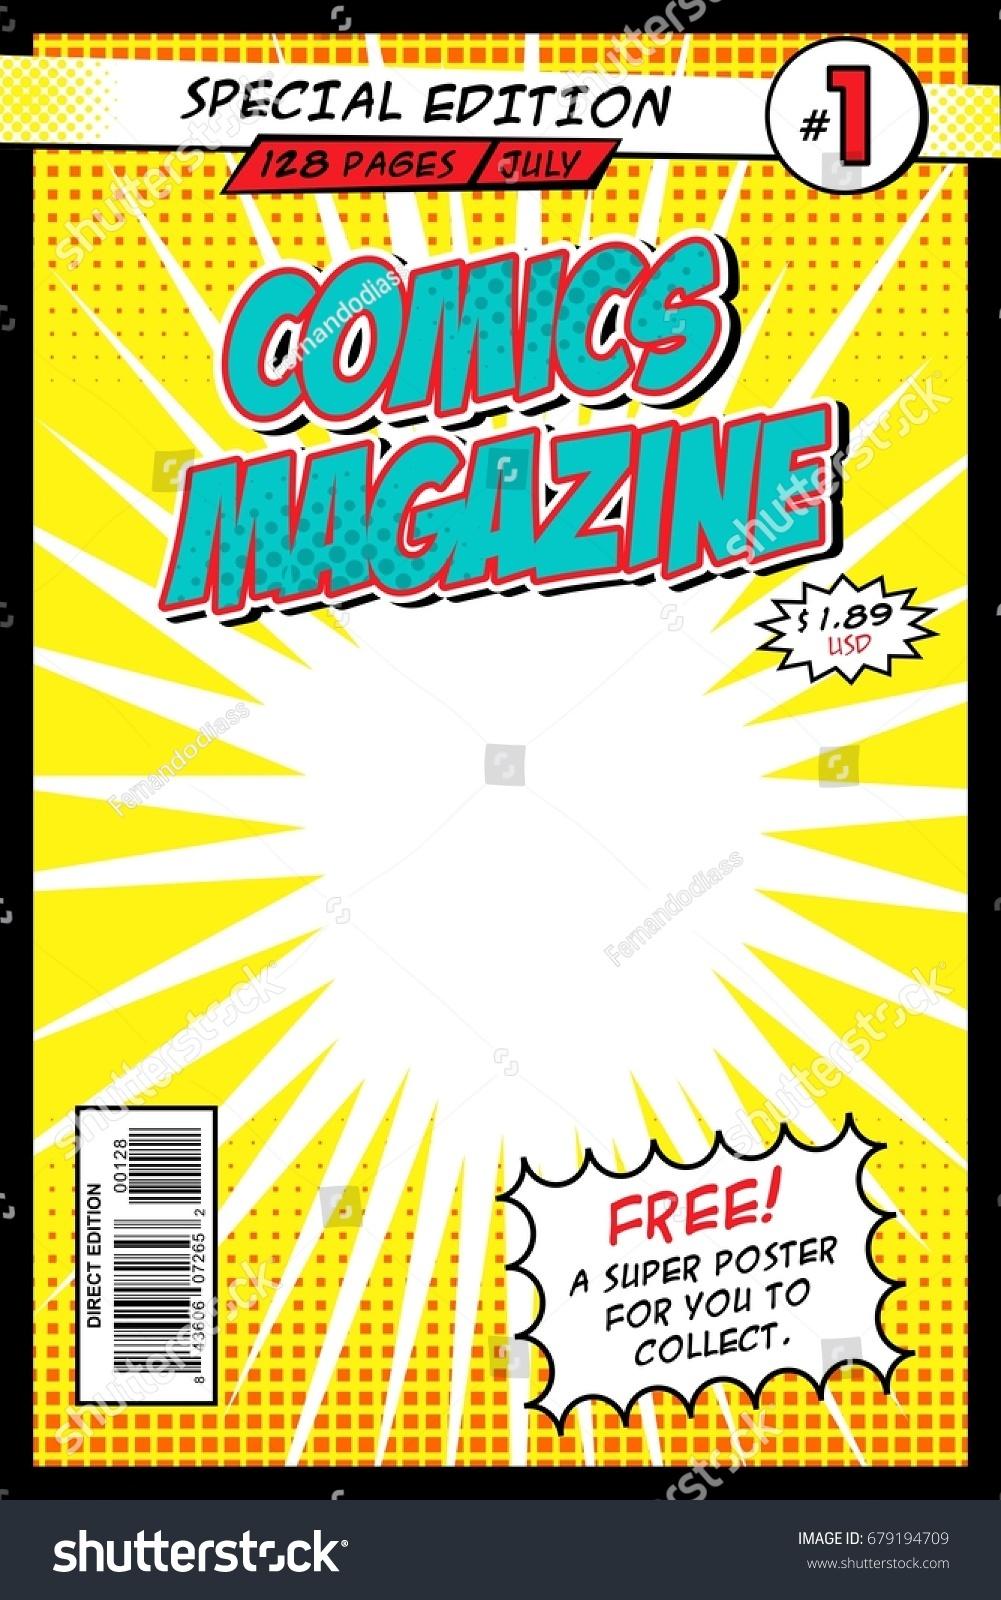 Comic Book Cover Template Vector Illustration Stock Vector 679194709 ...